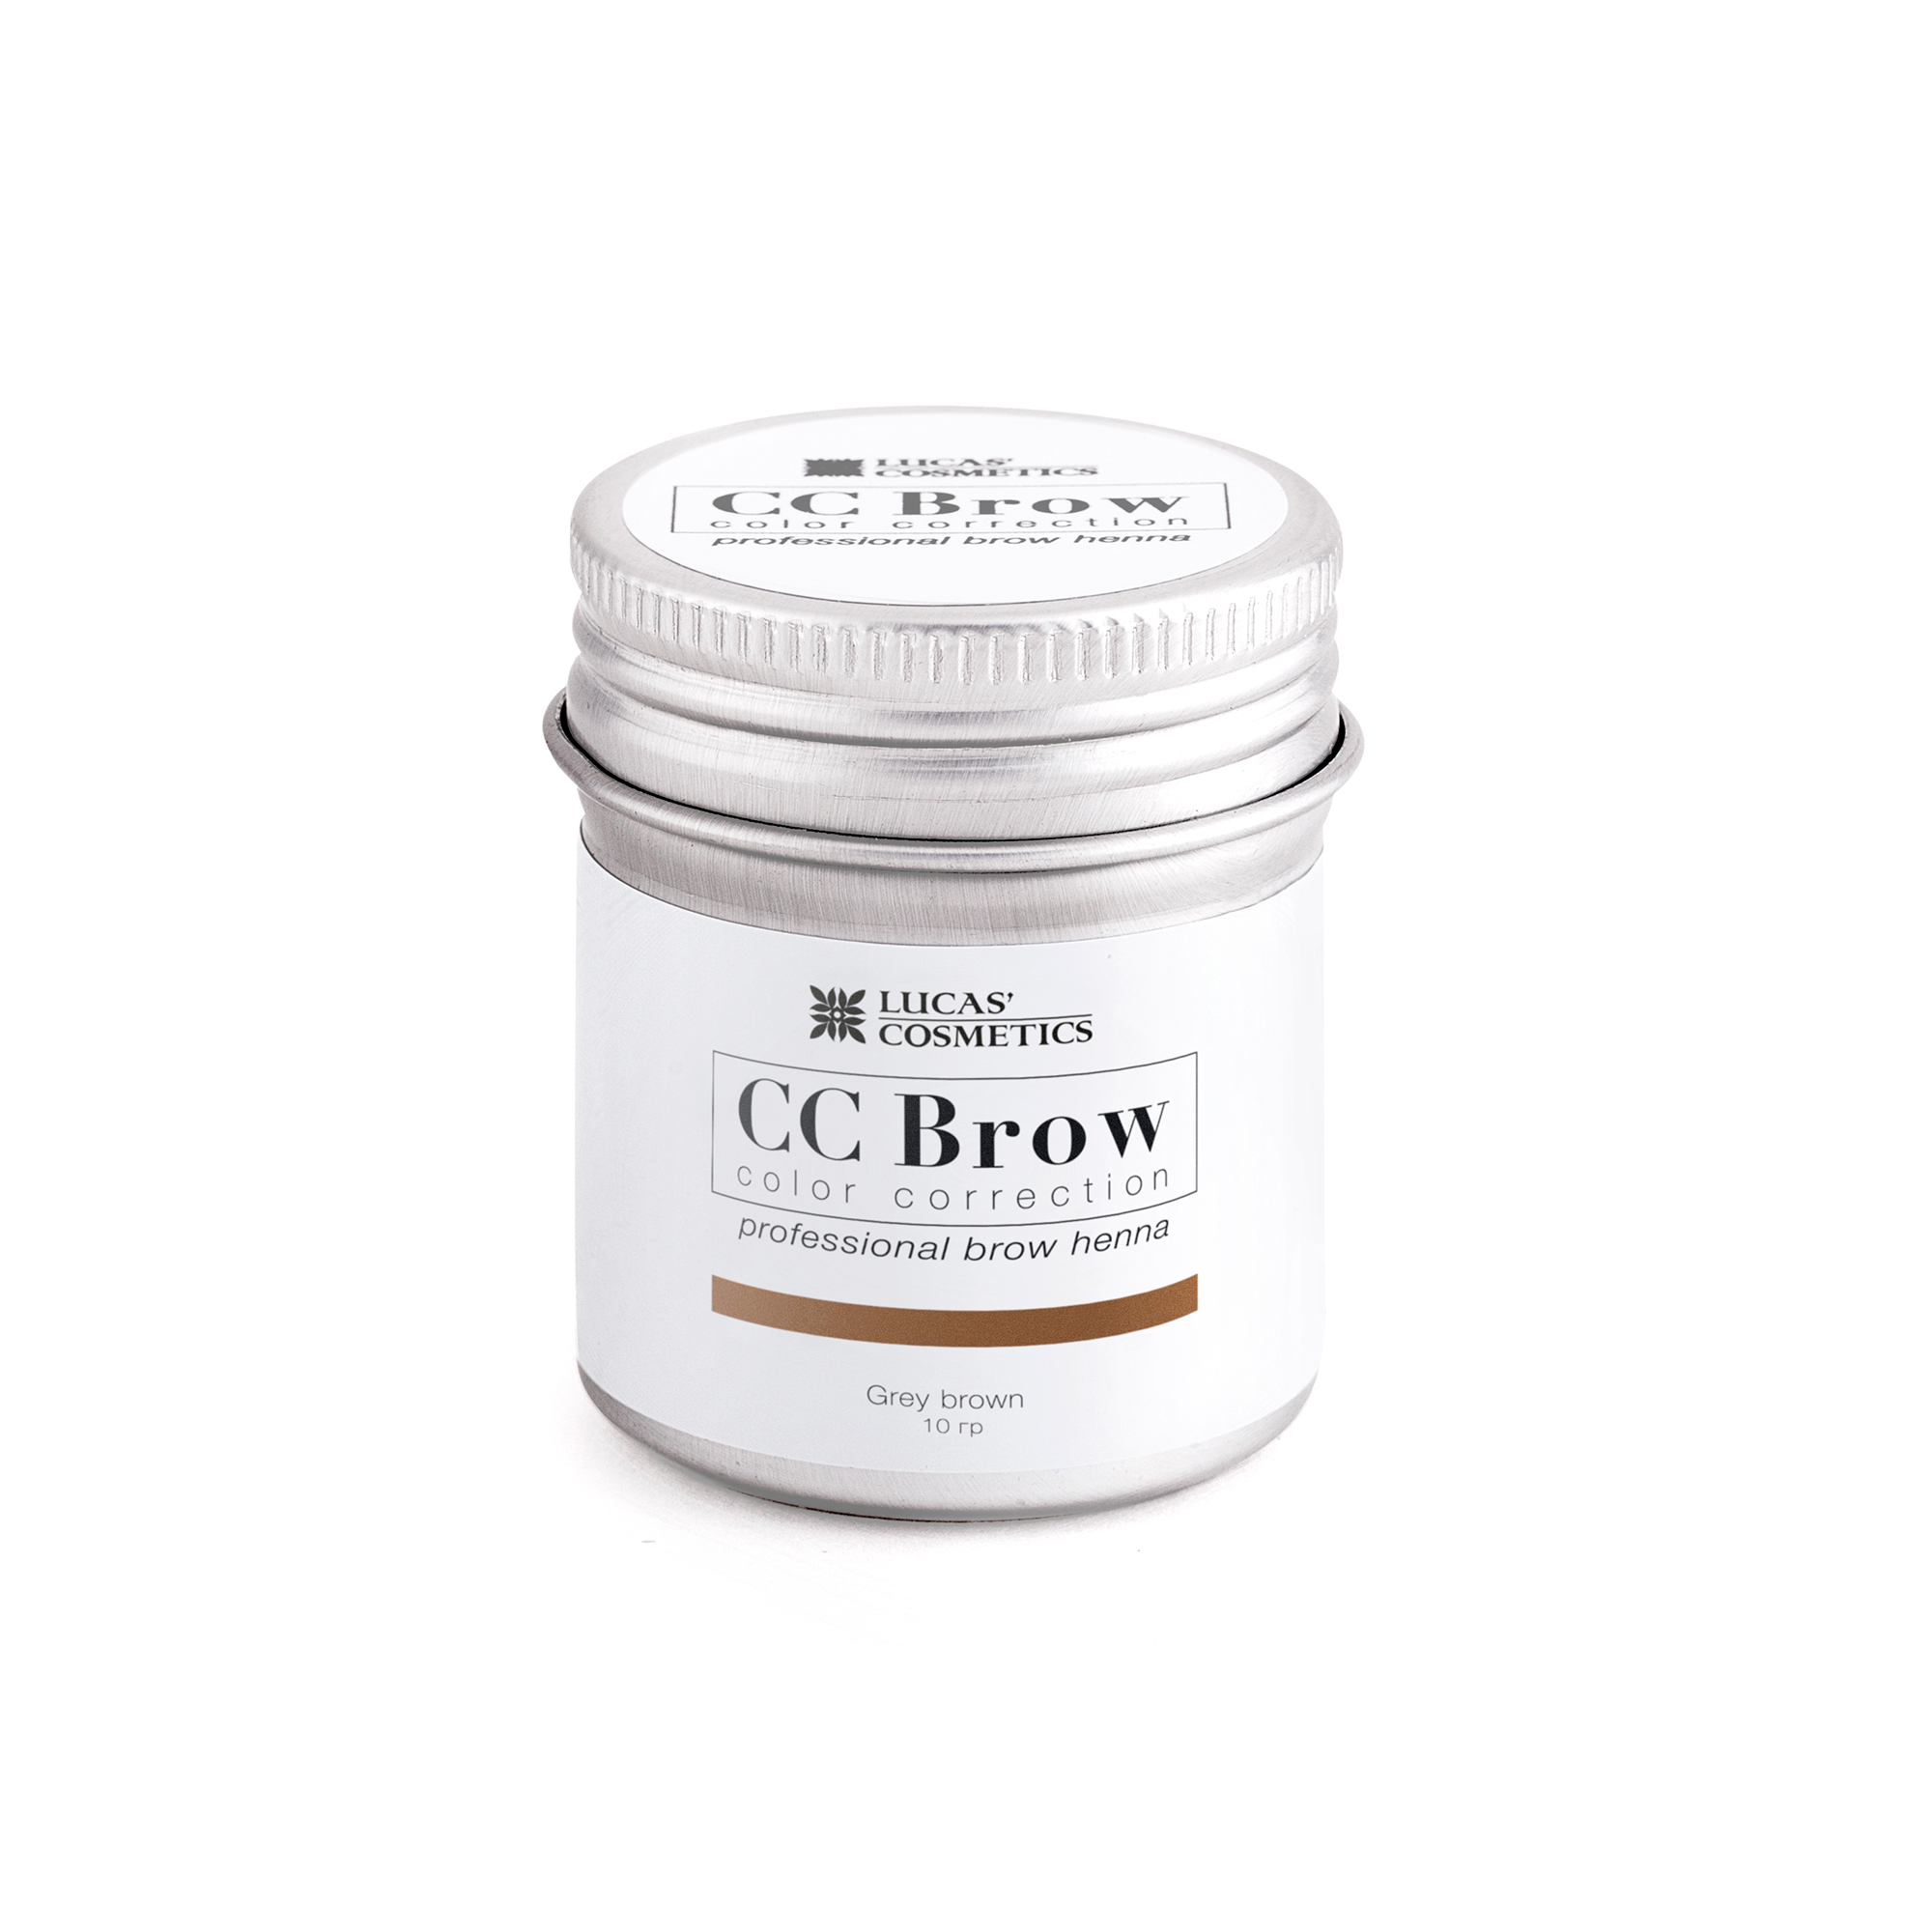 LUCAS' COSMETICS Хна для бровей в баночке (серо-коричневый) / CC Brow (grey brown), 10 гр -  Краски для бровей